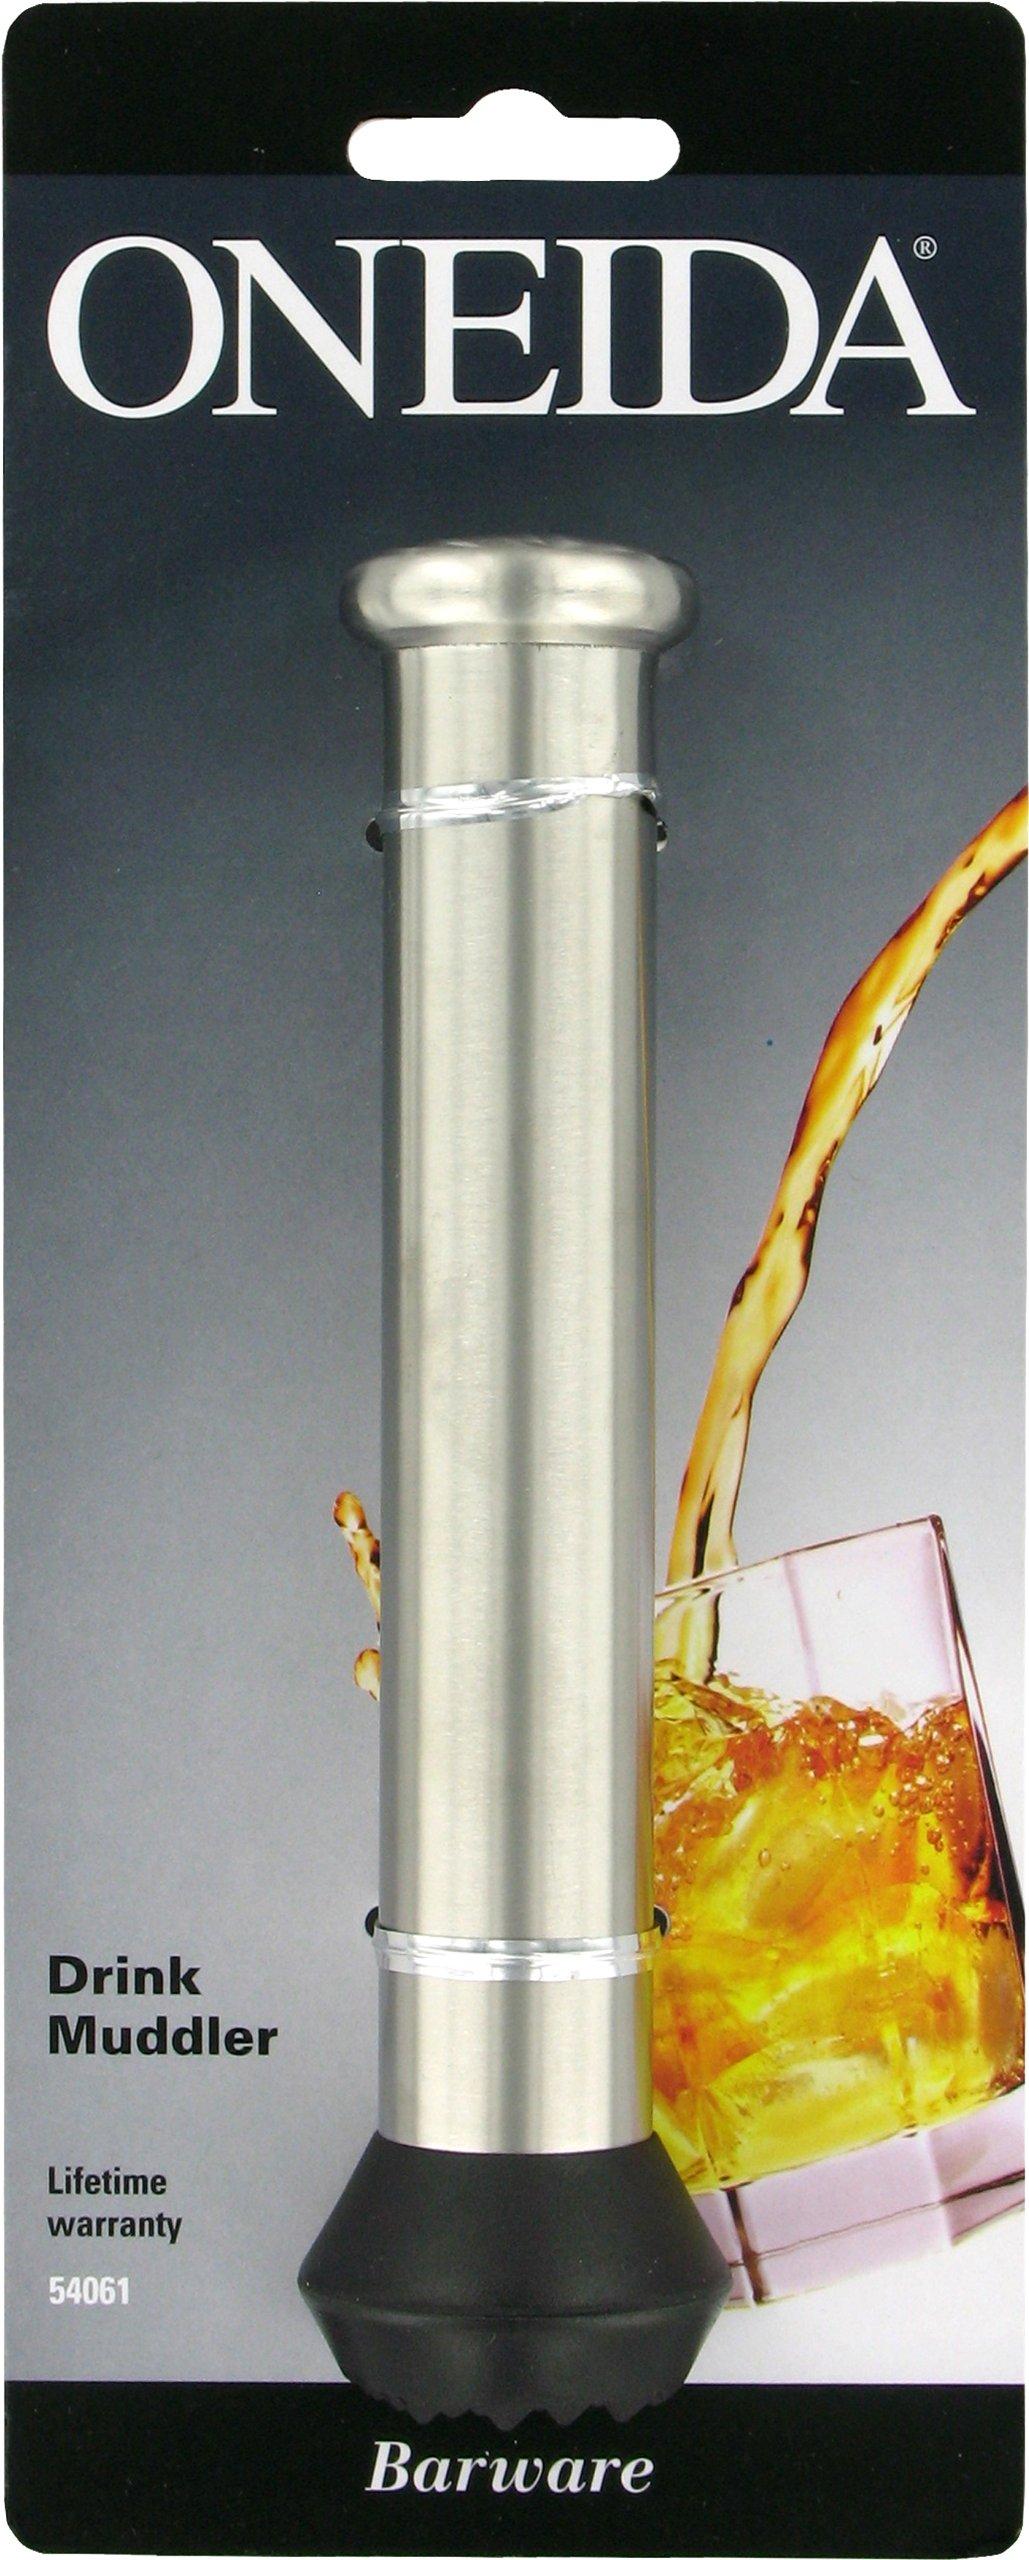 Oneida 6 1/2-Inch Muddler, Stainless Steel